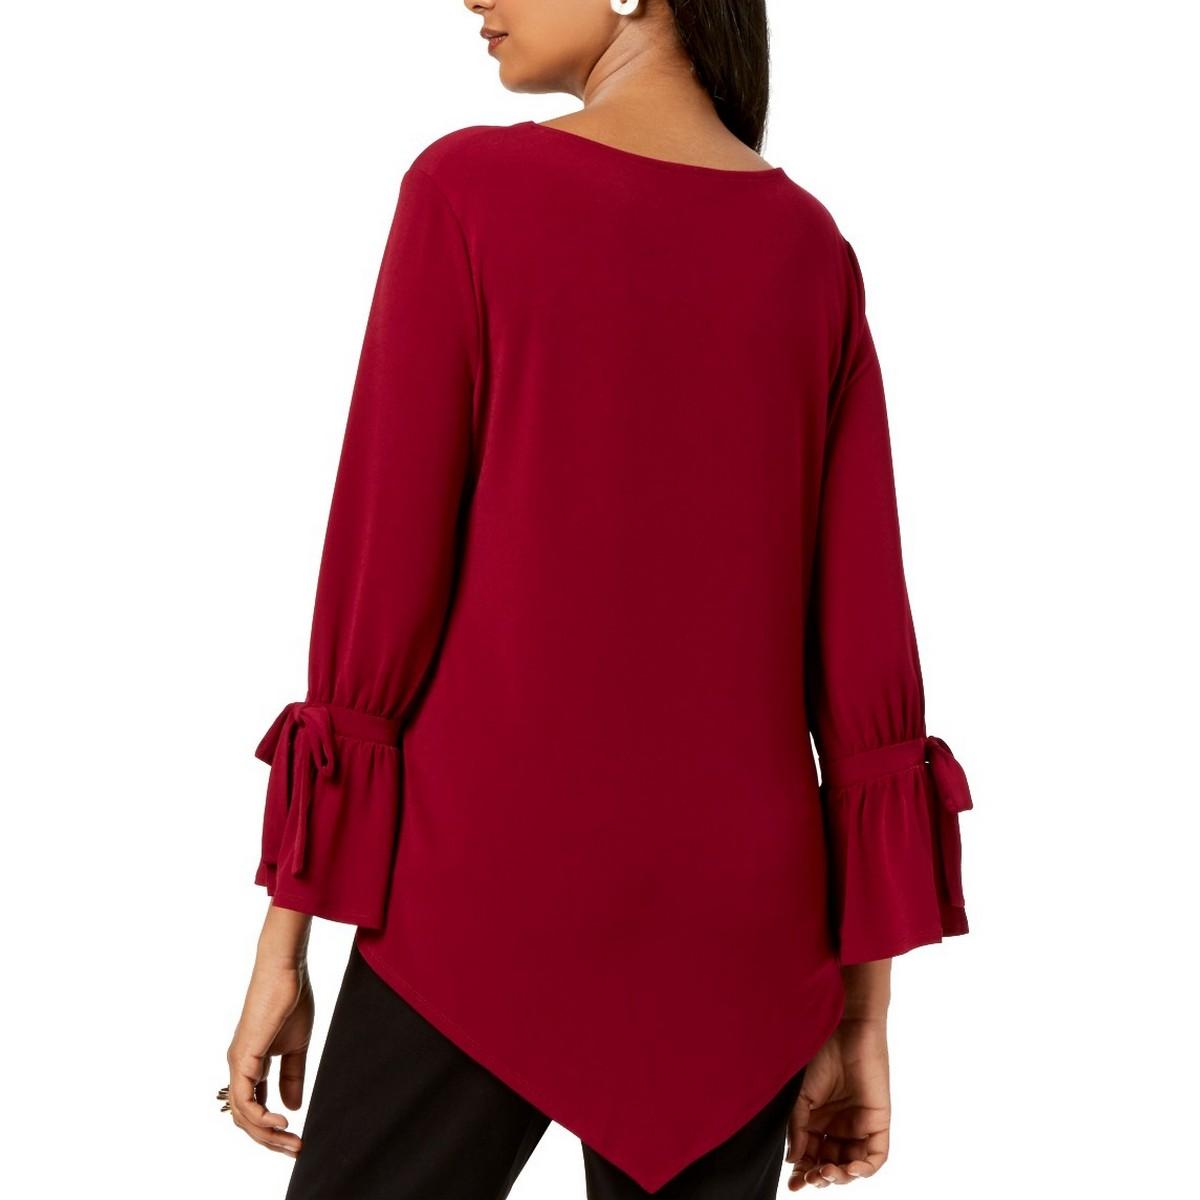 ALFANI-NEW-Women-039-s-Handkerchief-hem-Tie-Sleeve-Blouse-Shirt-Top-TEDO thumbnail 4